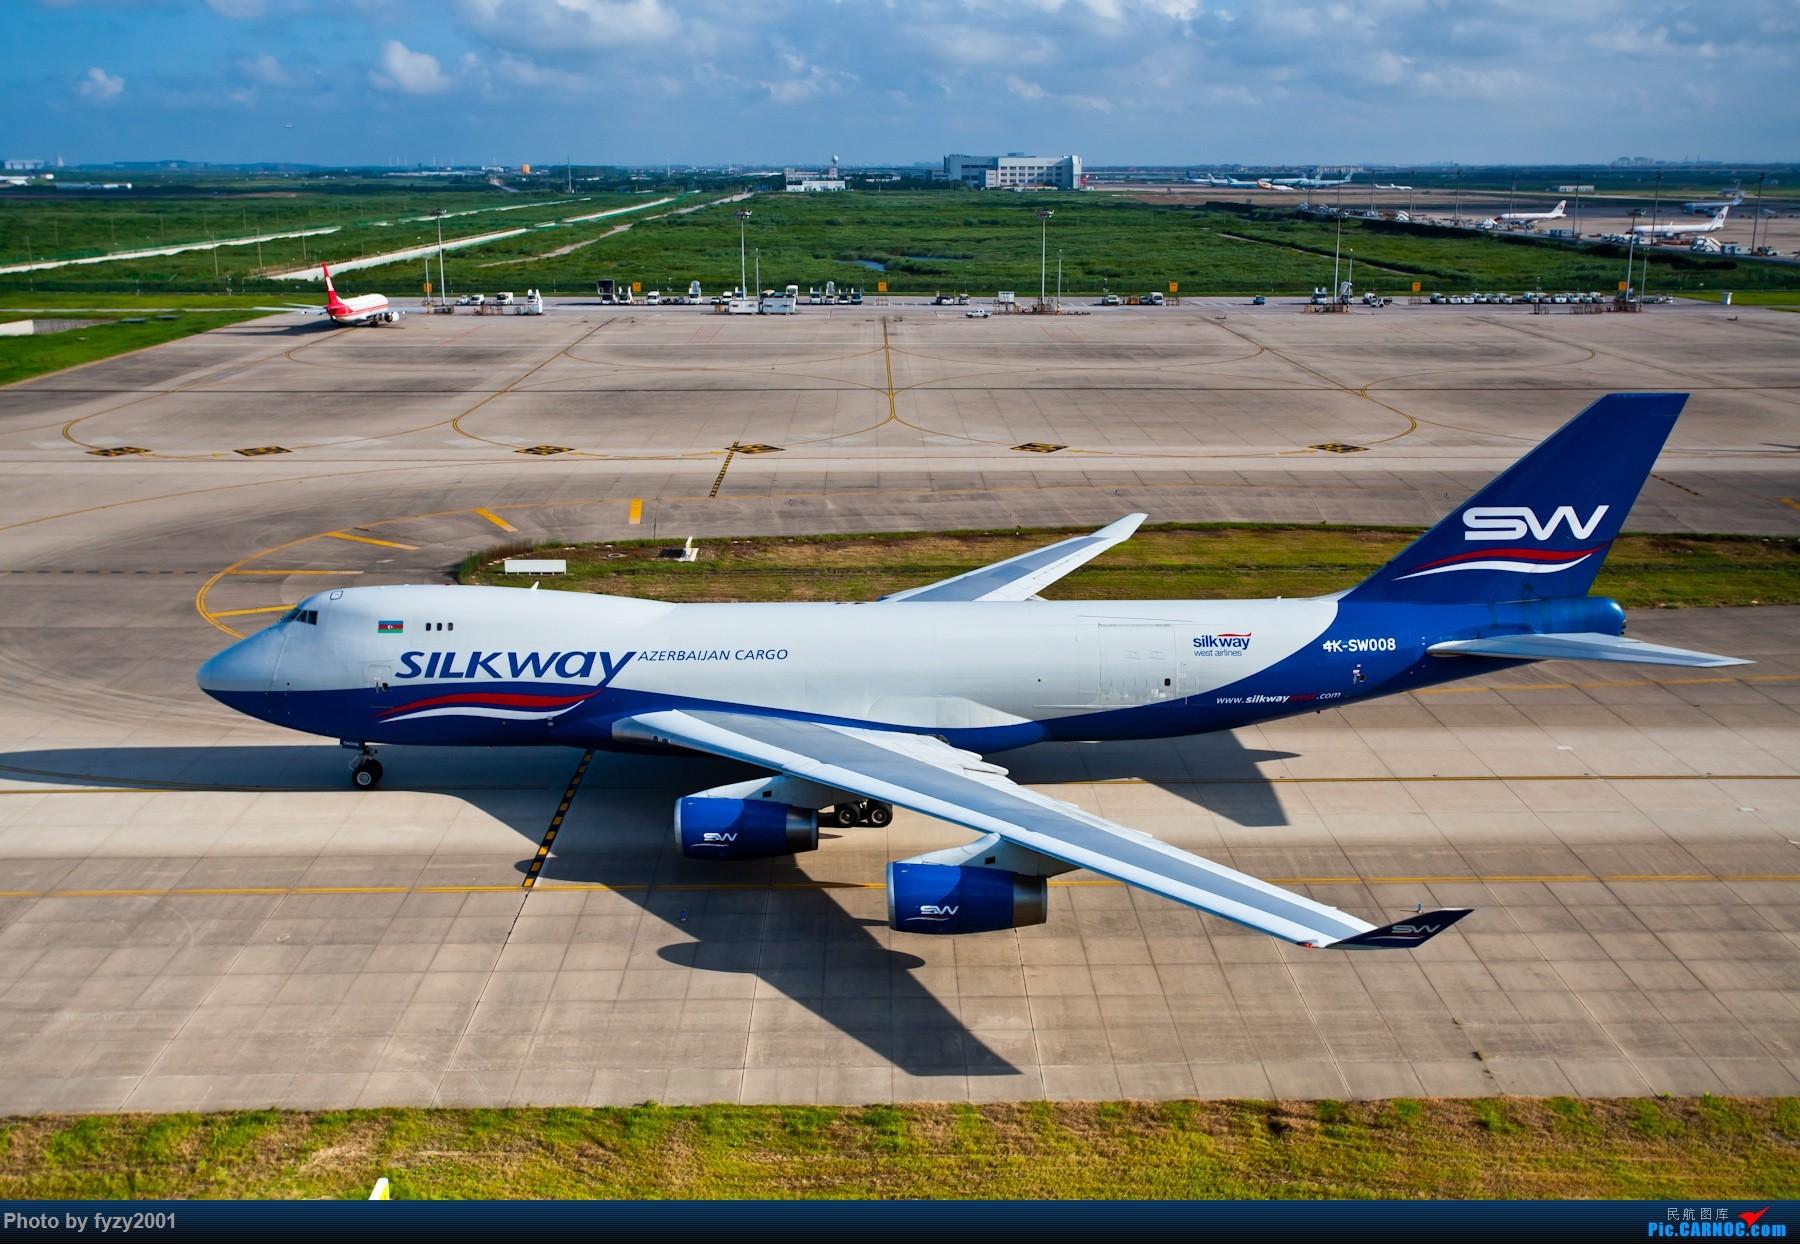 Re:[原创][无锡西站]炎炎夏日里的PVG~~~~(大图) BOEING 747-400 4K-SW008 中国上海浦东国际机场